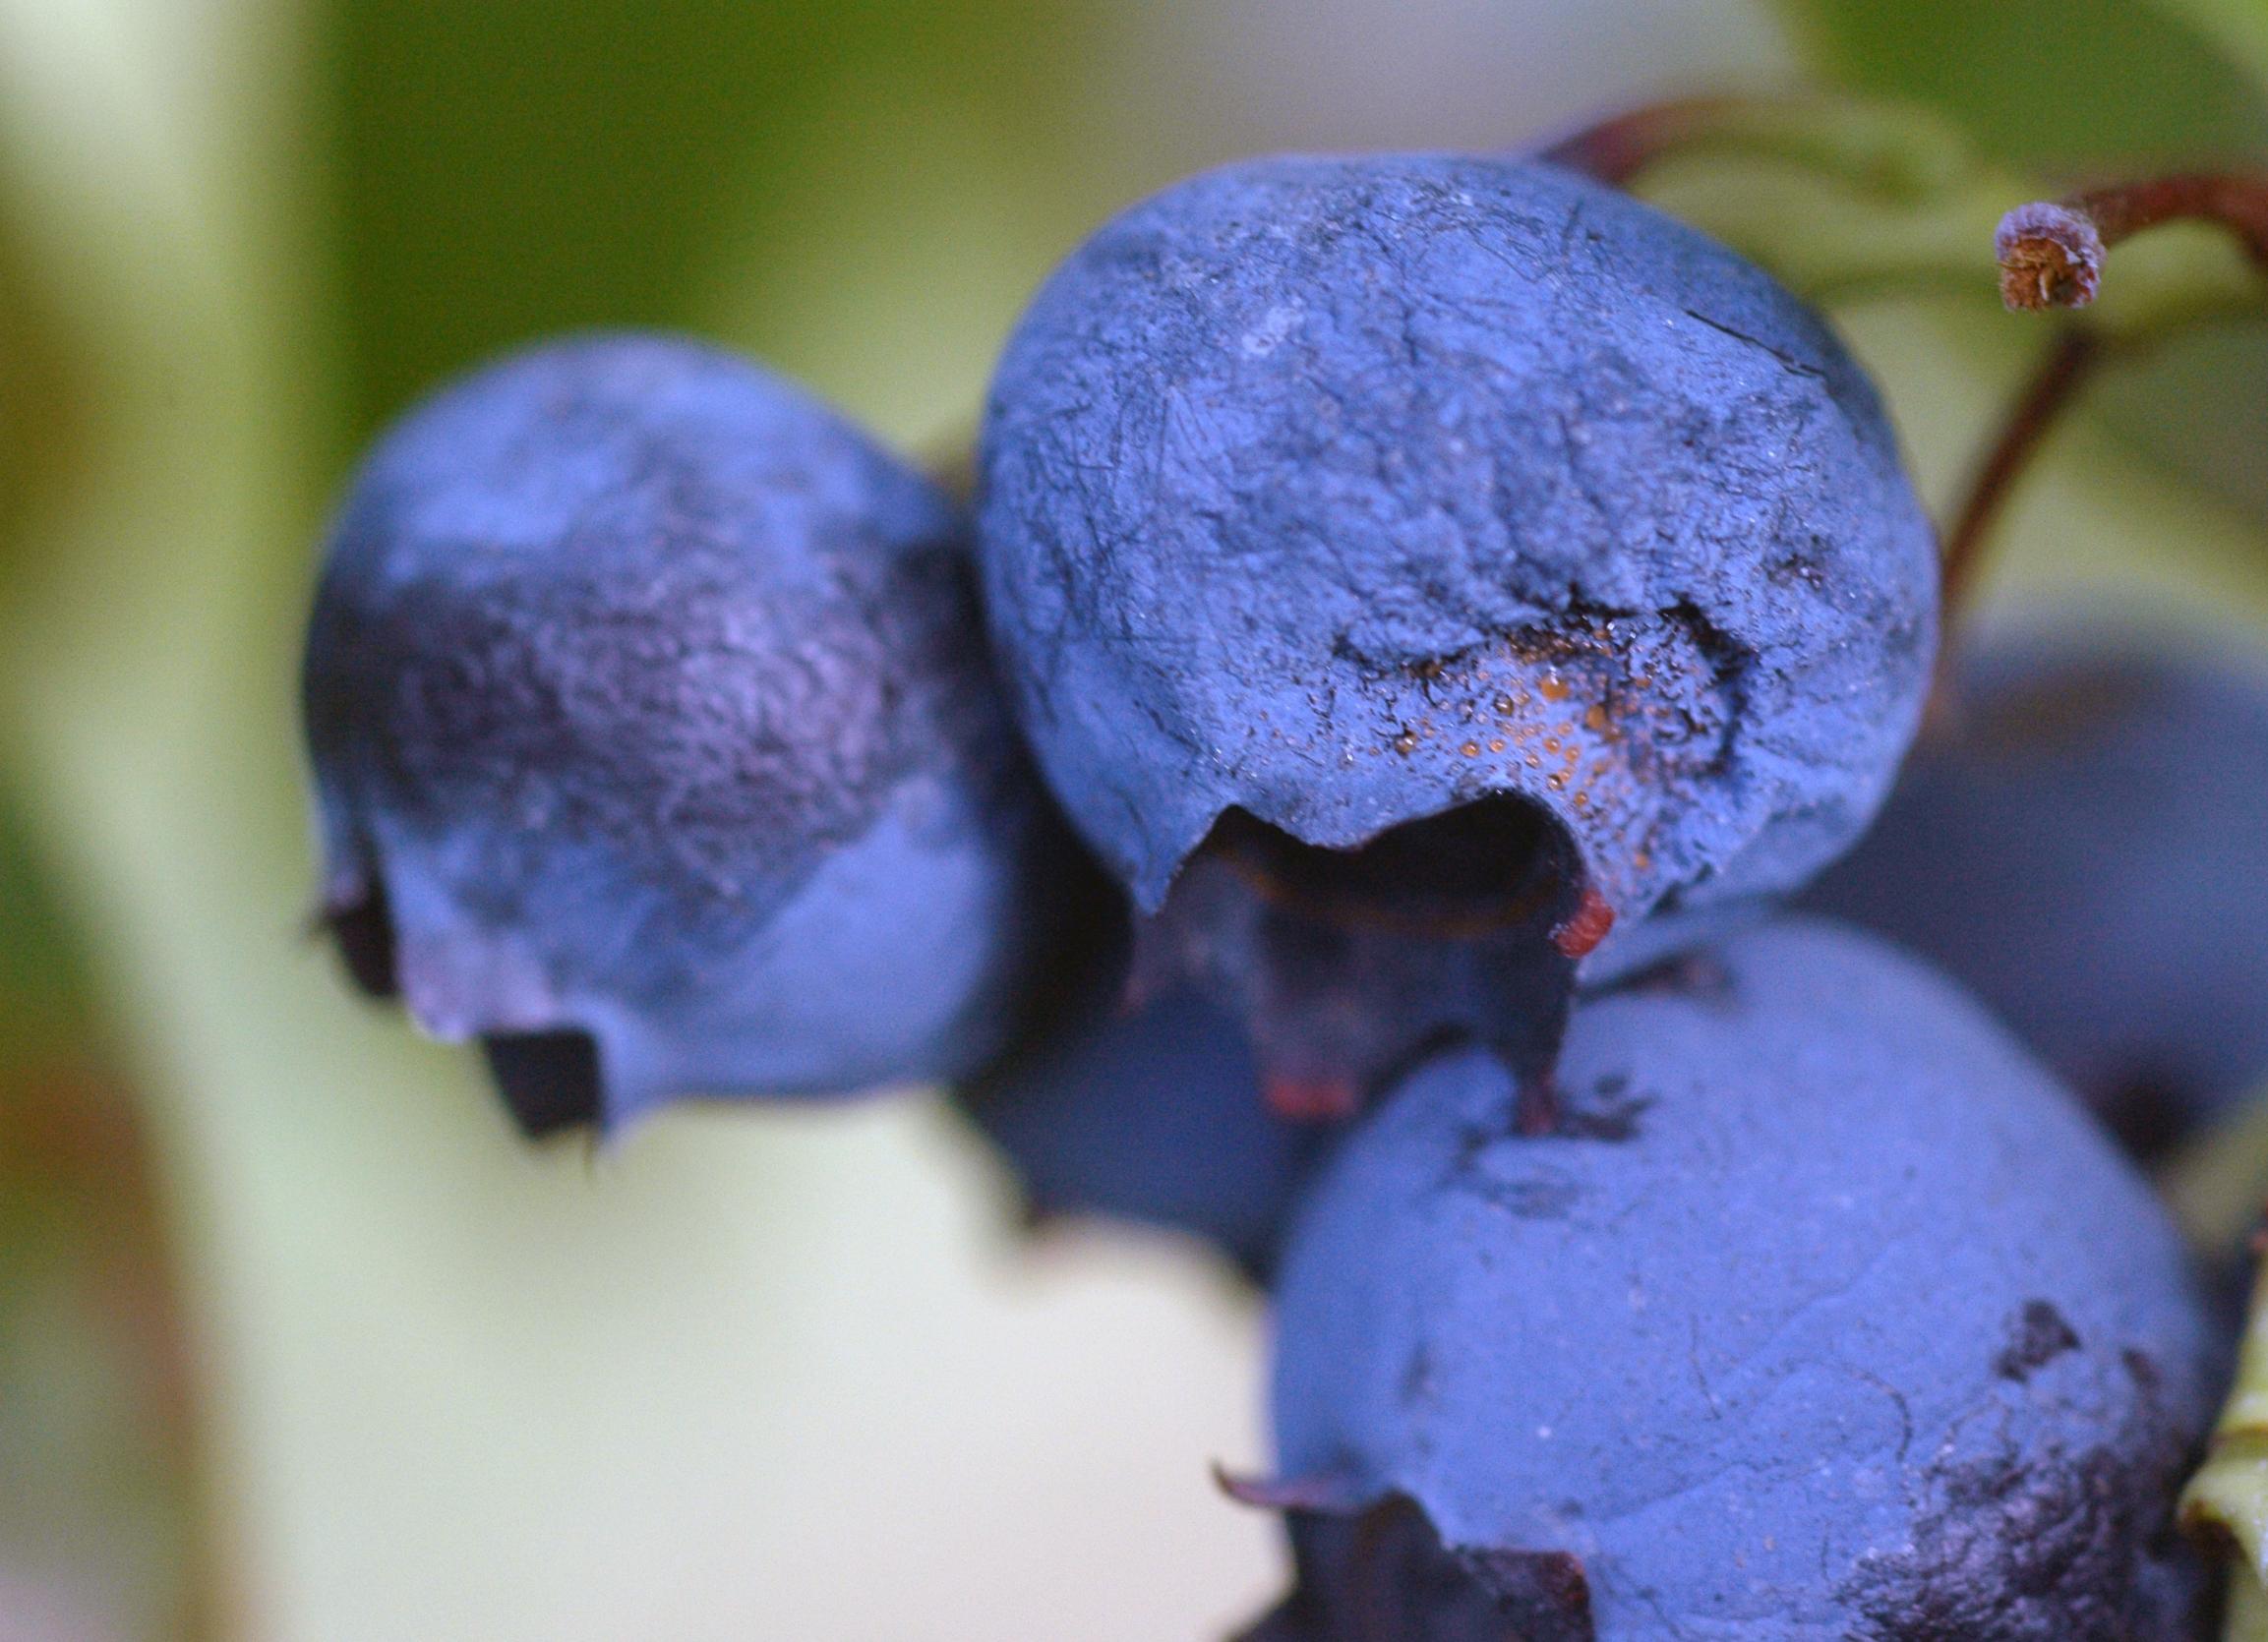 Blueberry Vaccinium Corymbosum Ripe Rot Anthracnose